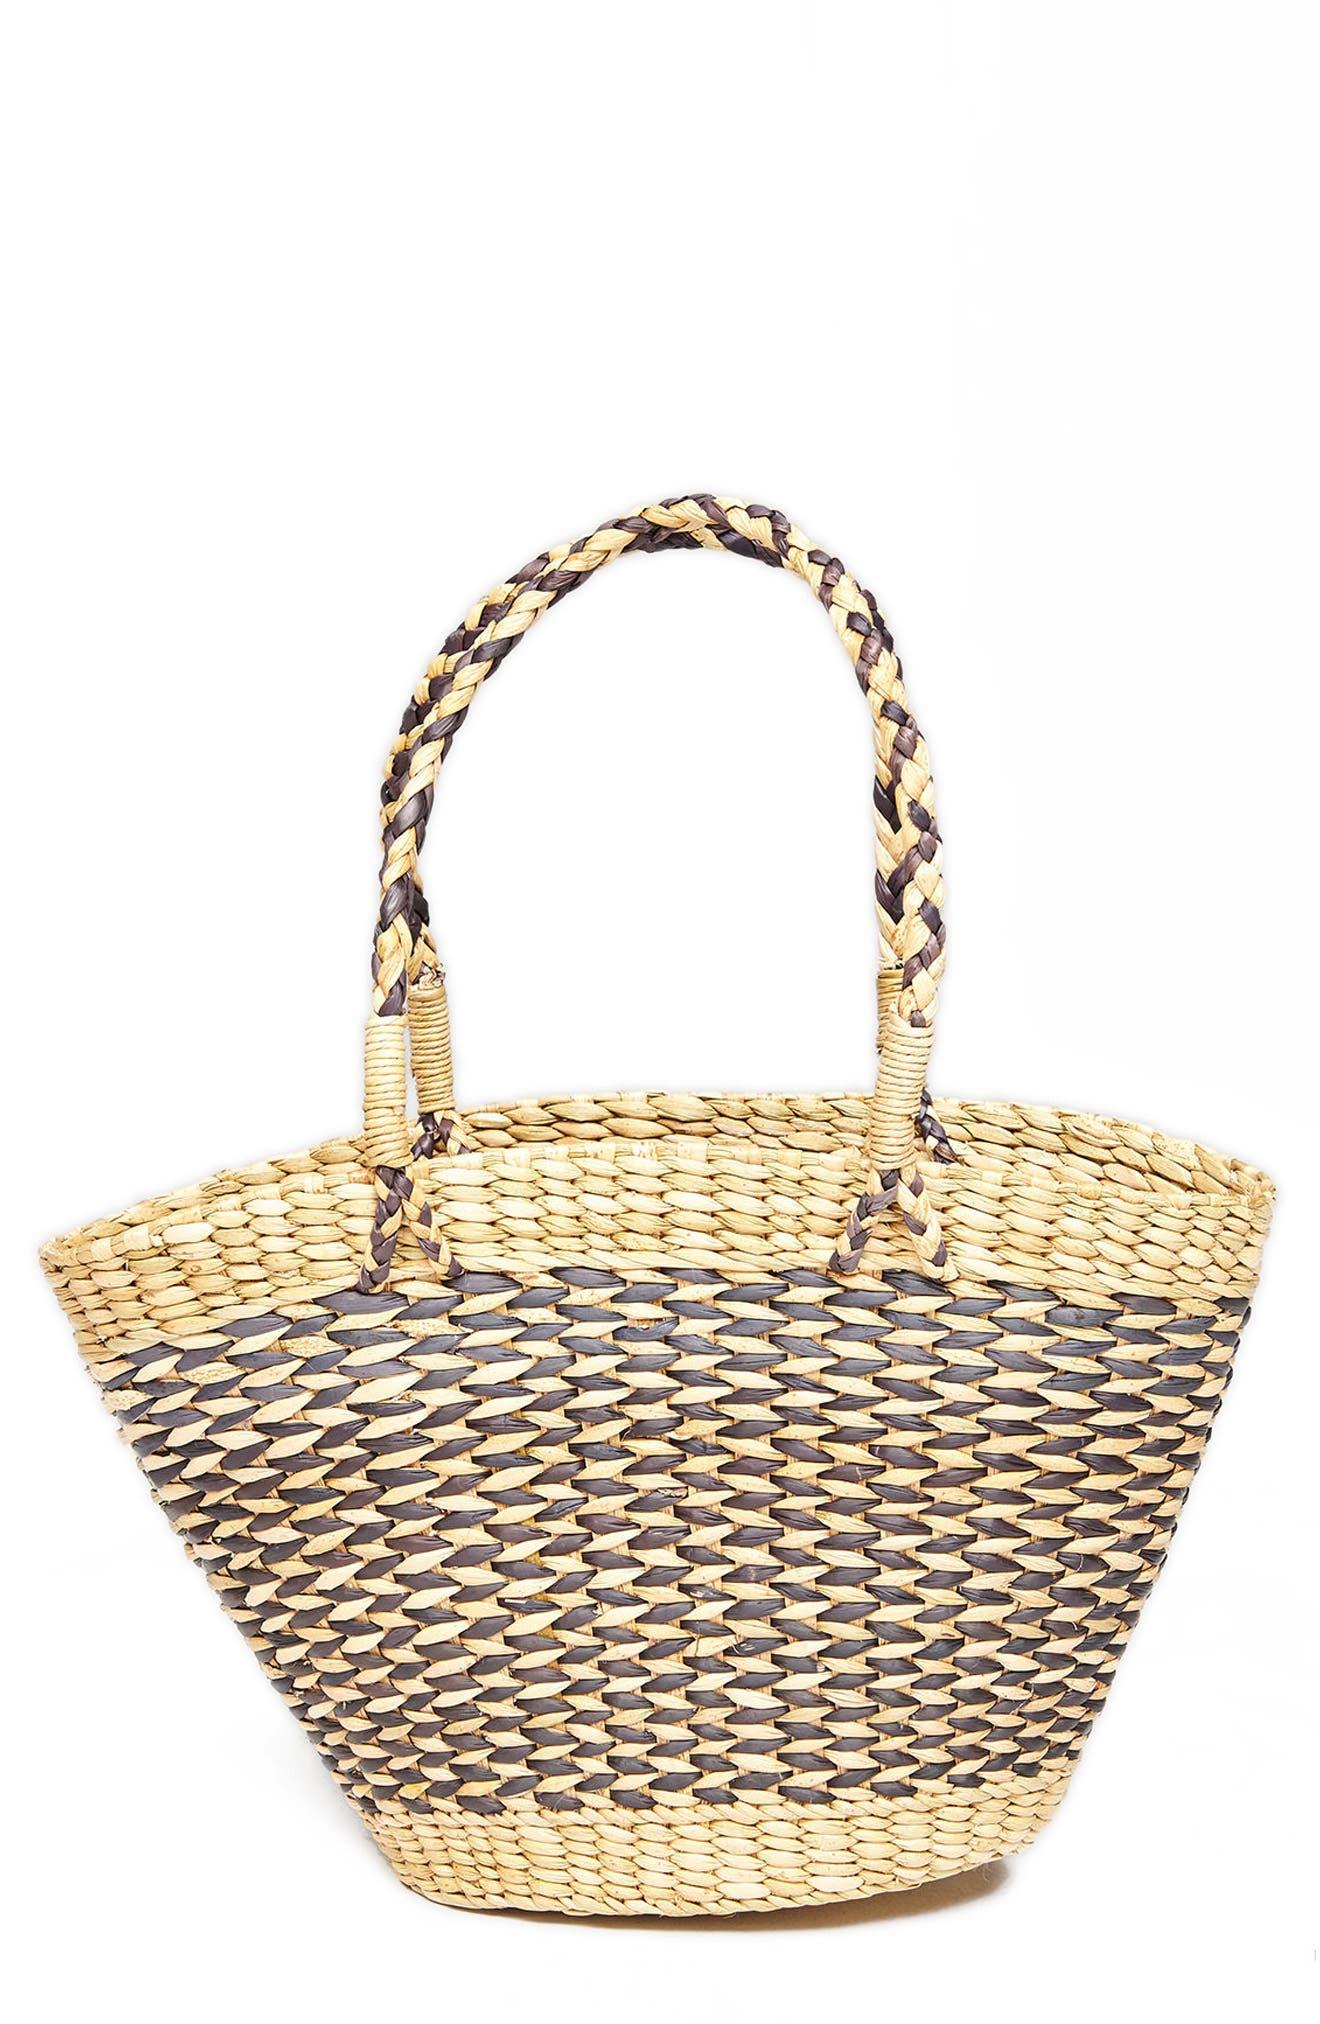 Goodie Basket Straw Tote,                             Main thumbnail 1, color,                             001